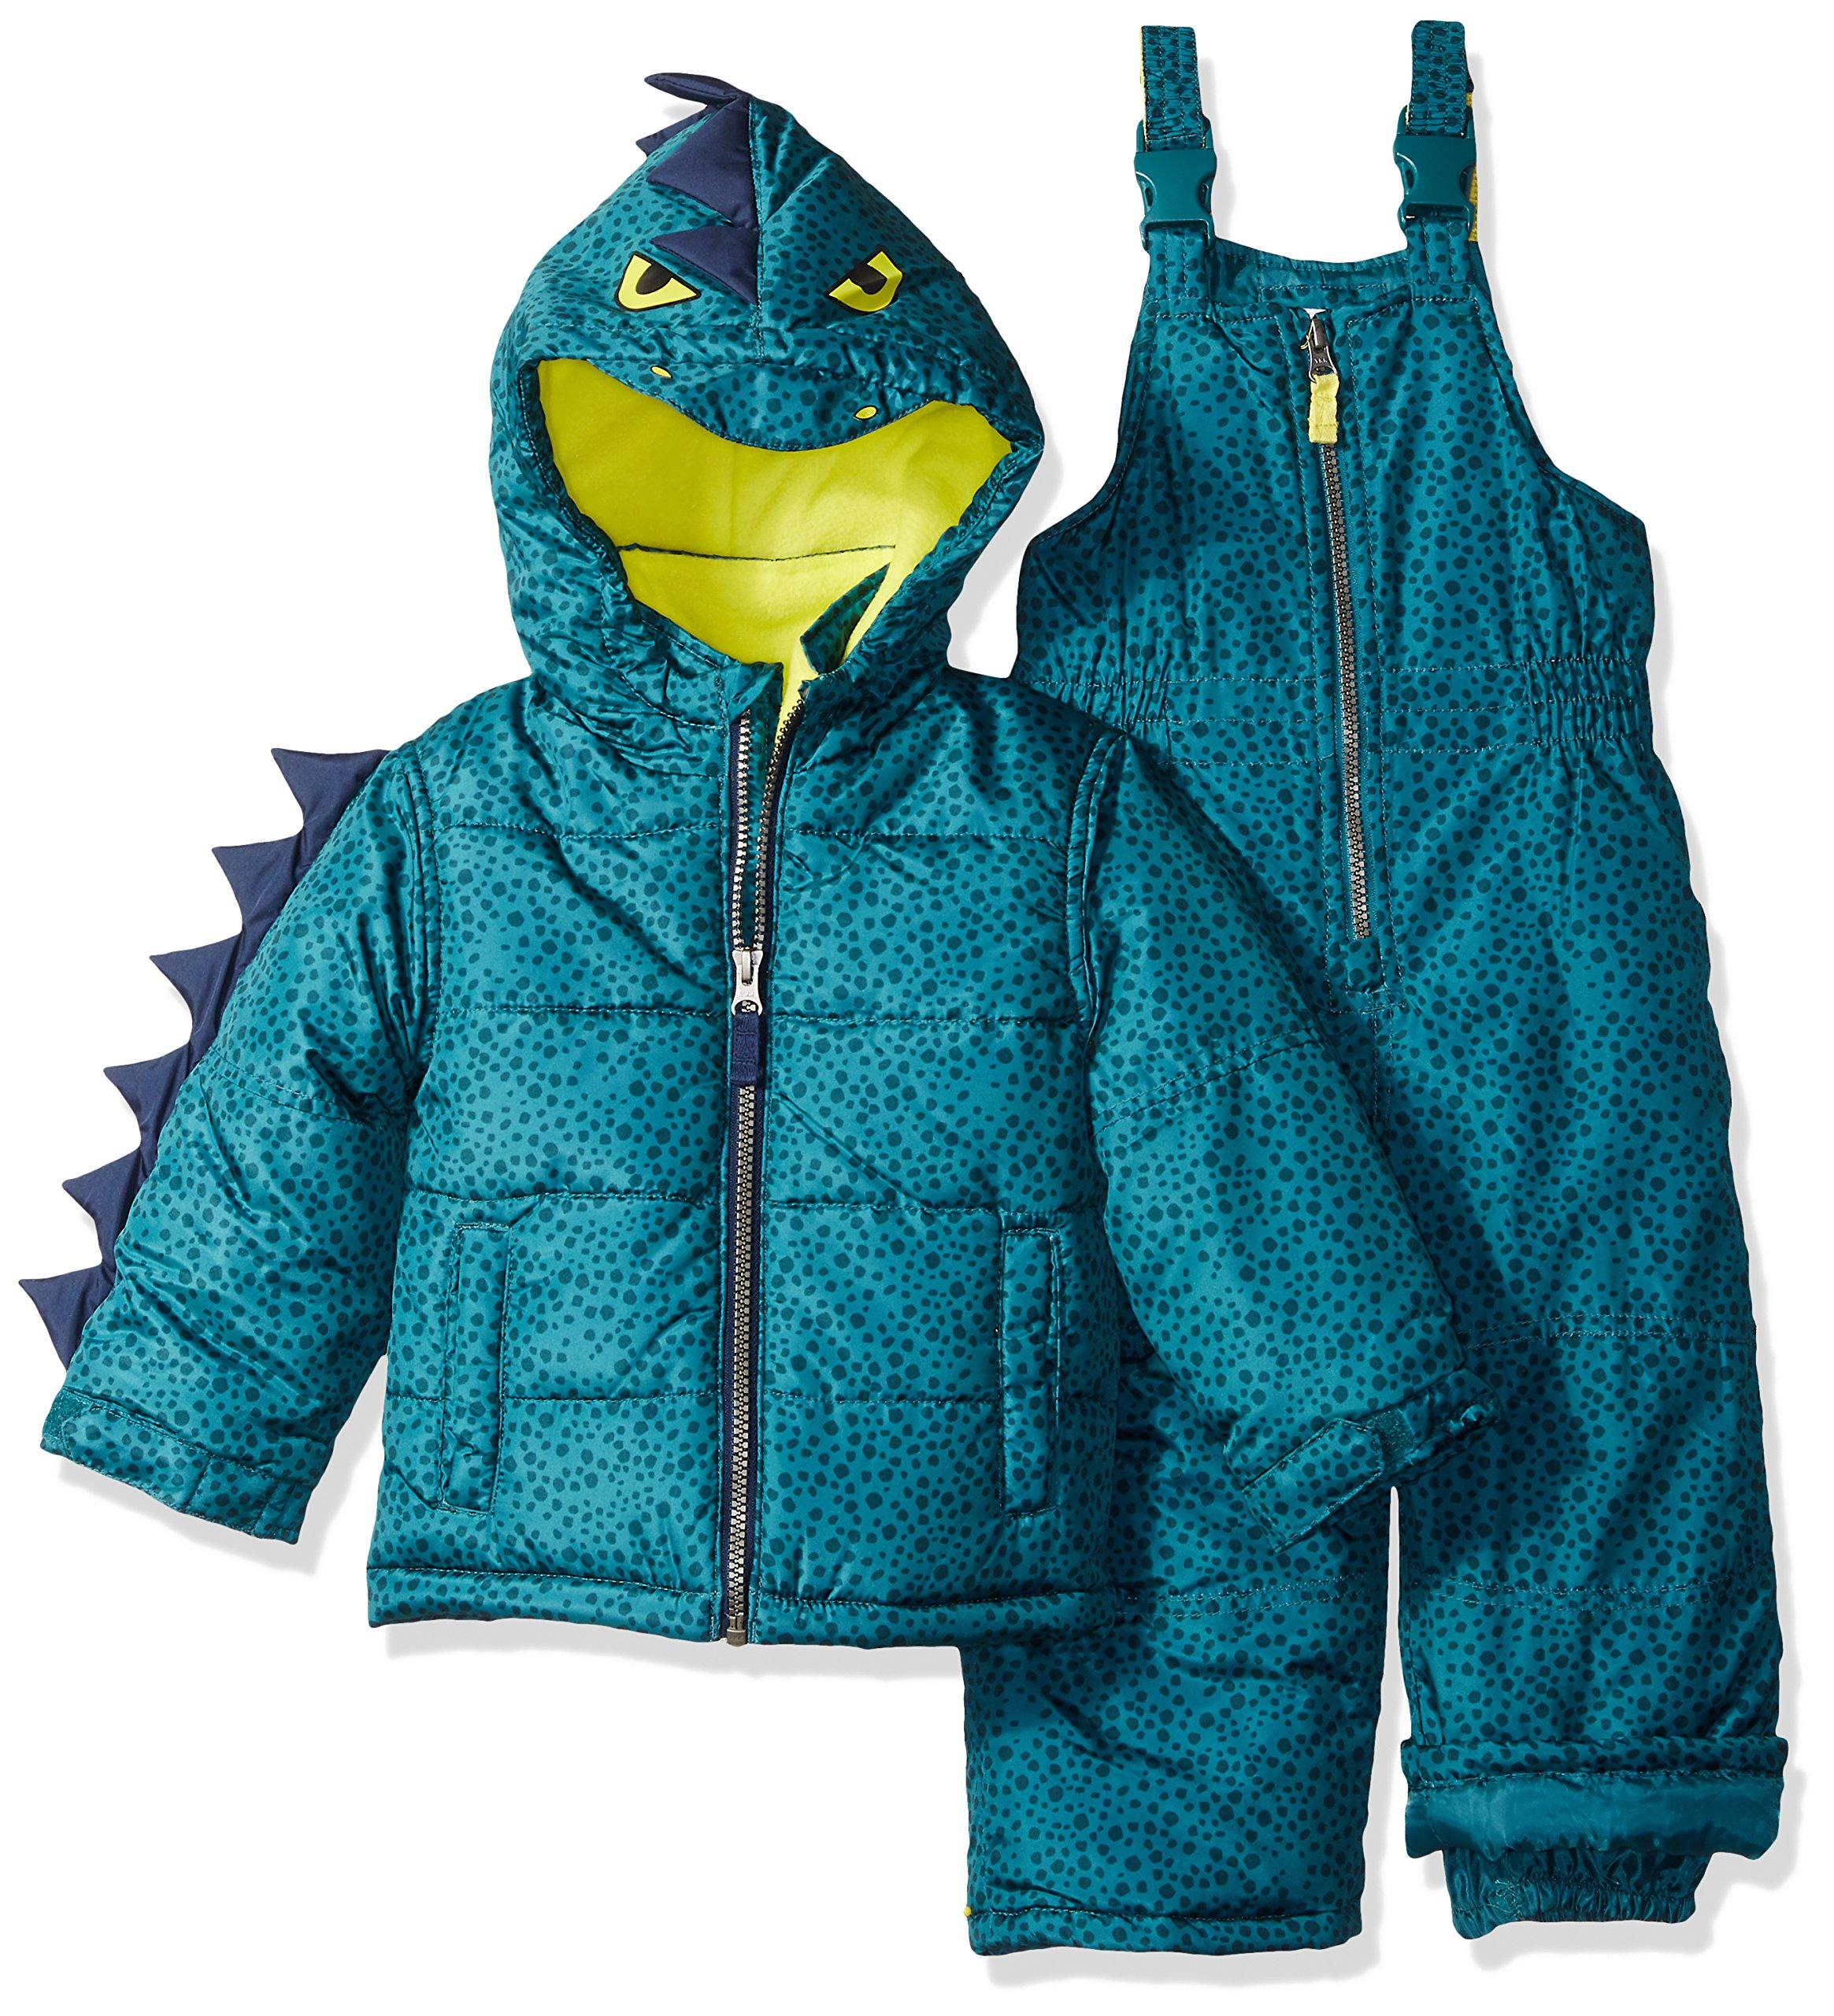 Carter's Little Boys' Character Snowsuit, Green Dinosaur, 4